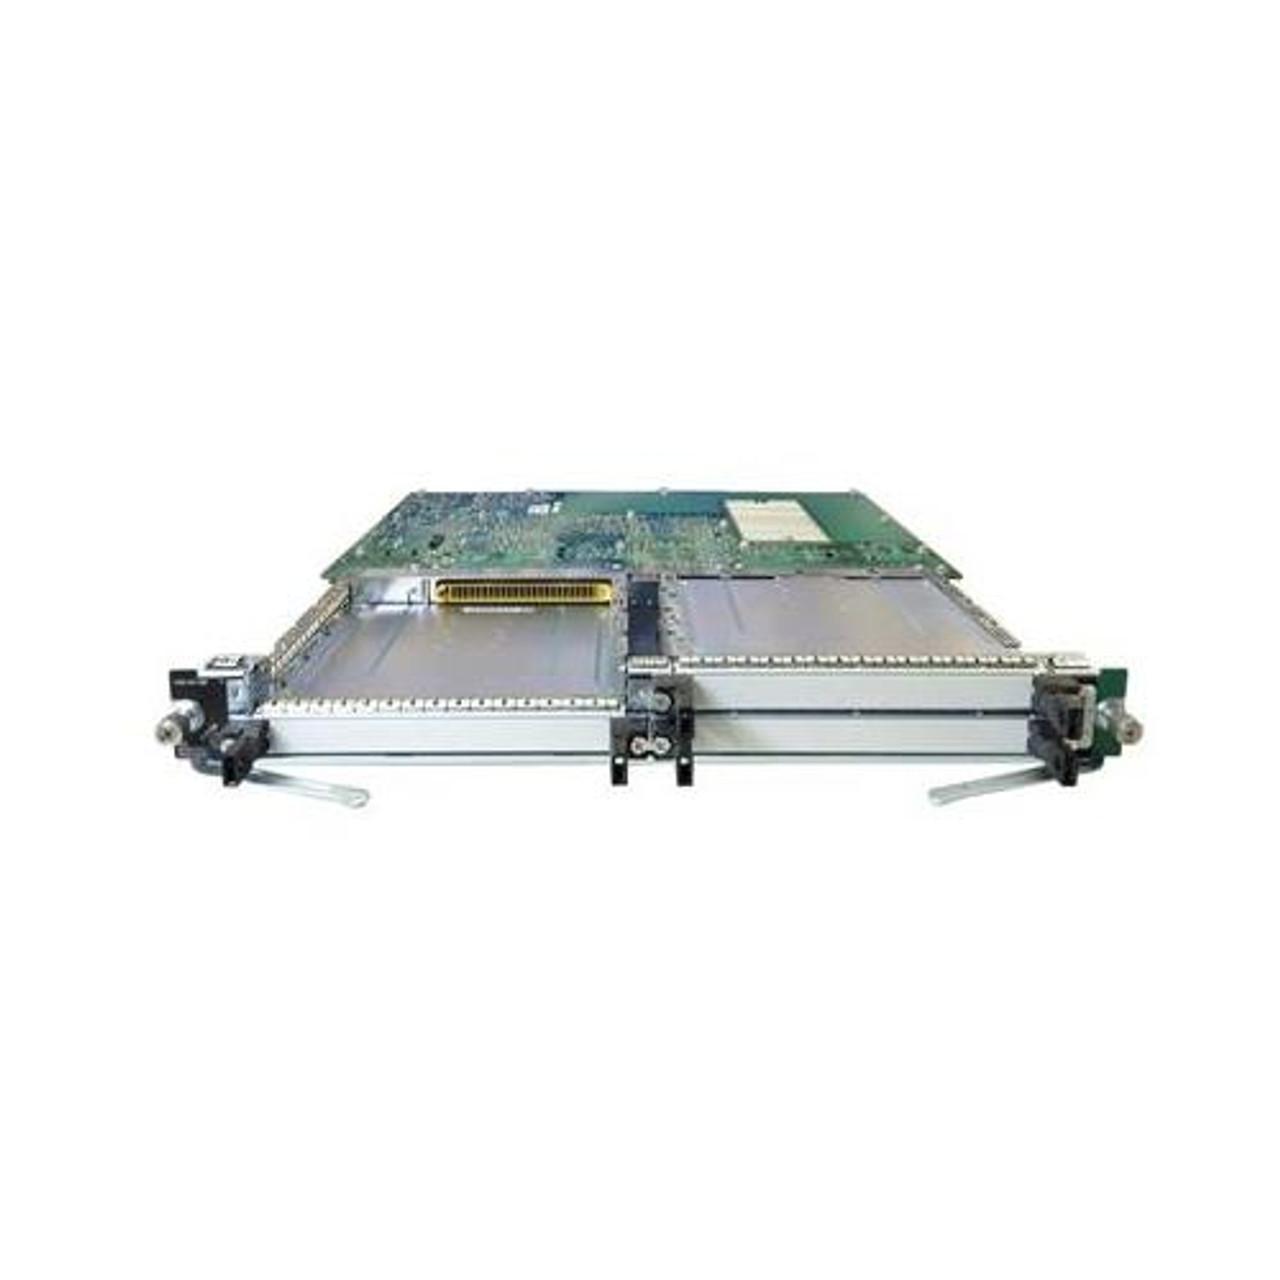 CPHOLSTER7925G Cisco 7925g Belt Holster (Refurbished)